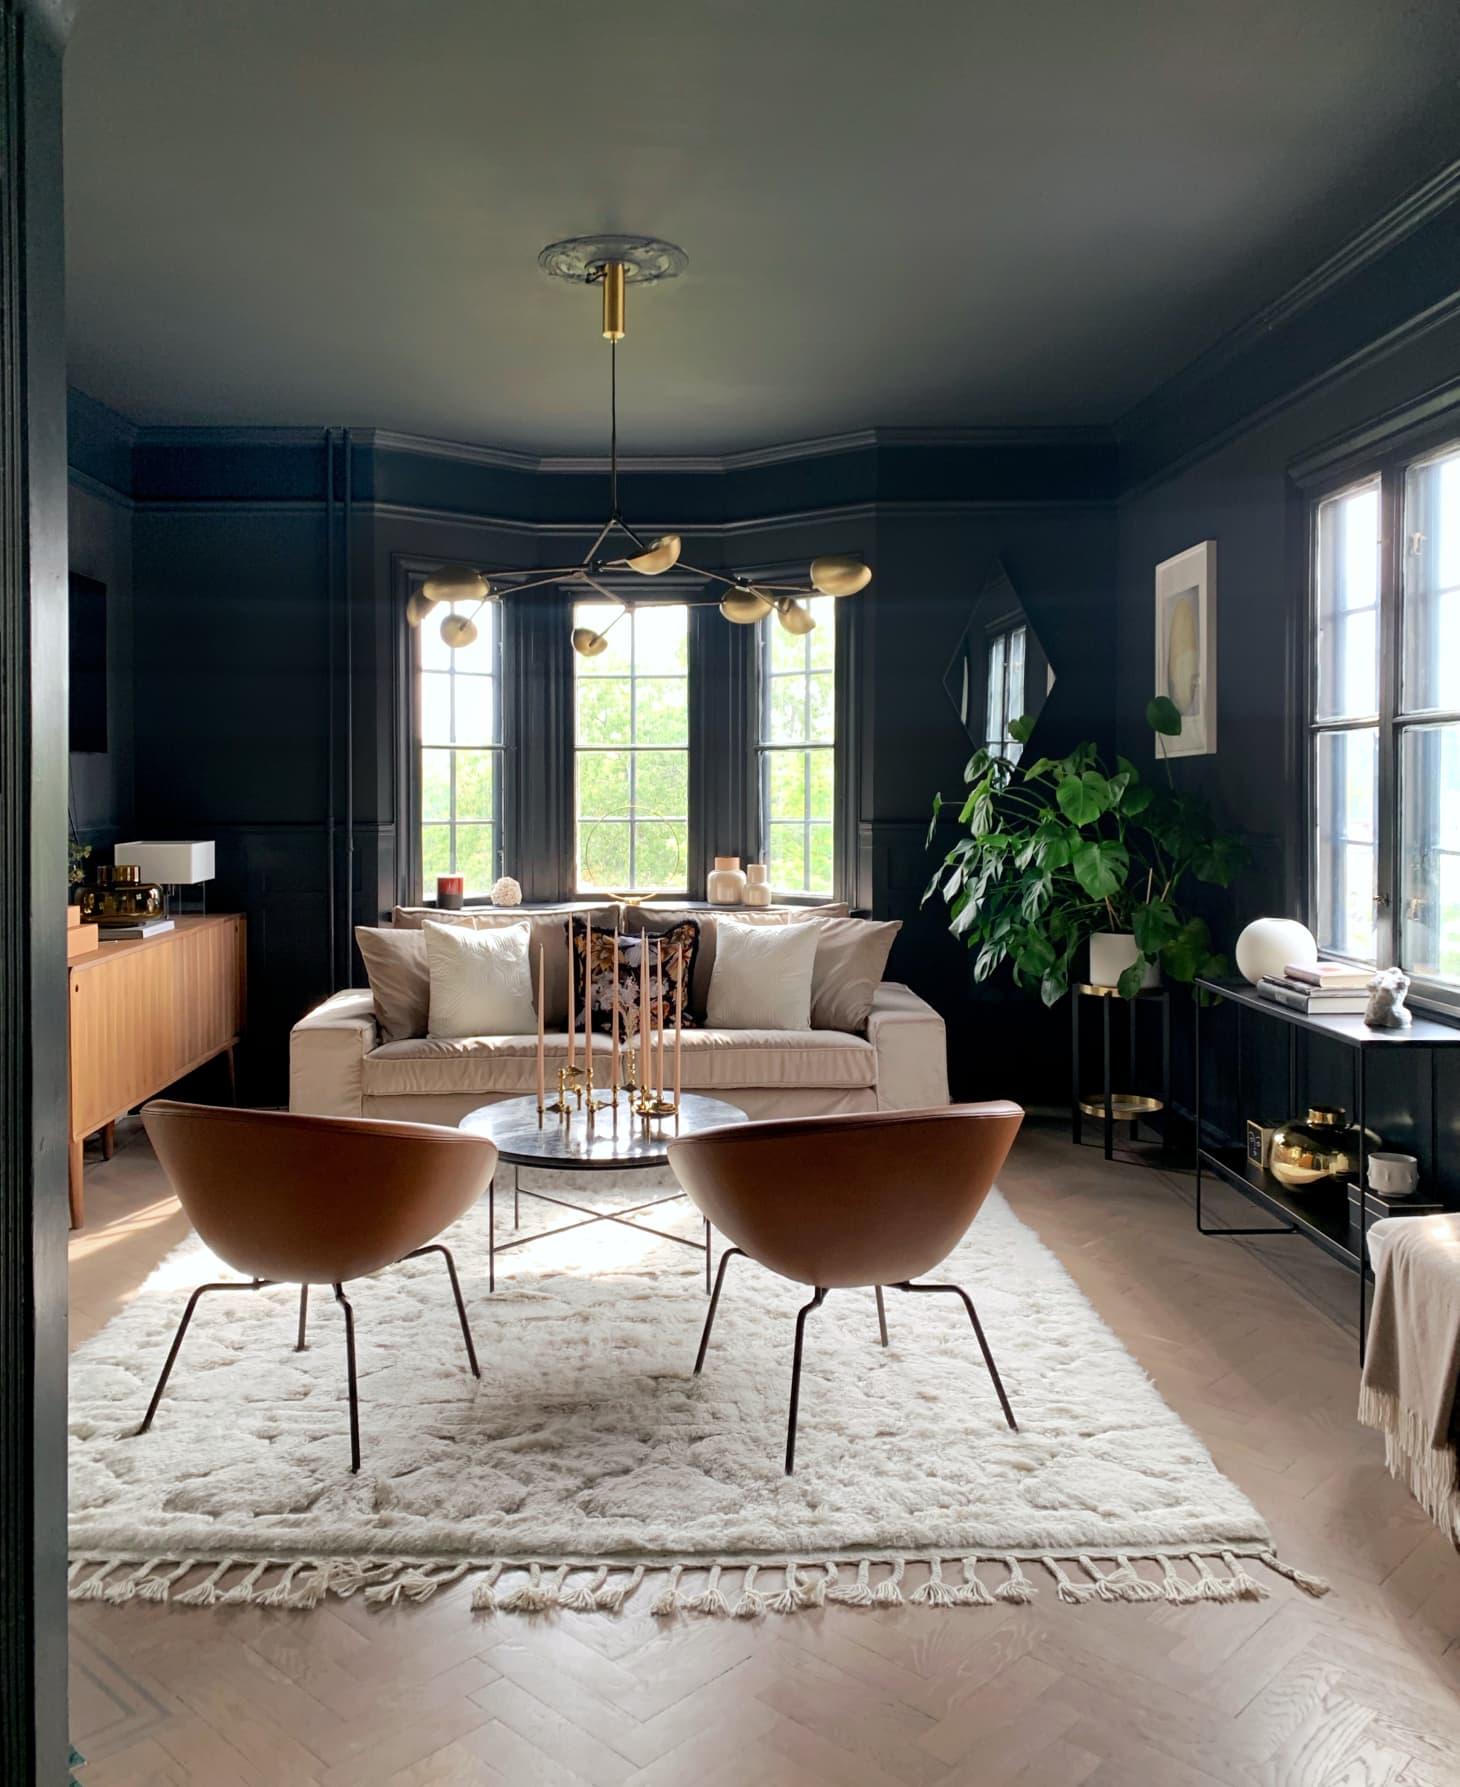 Hannas änglar scandinavian decor sweden home photos